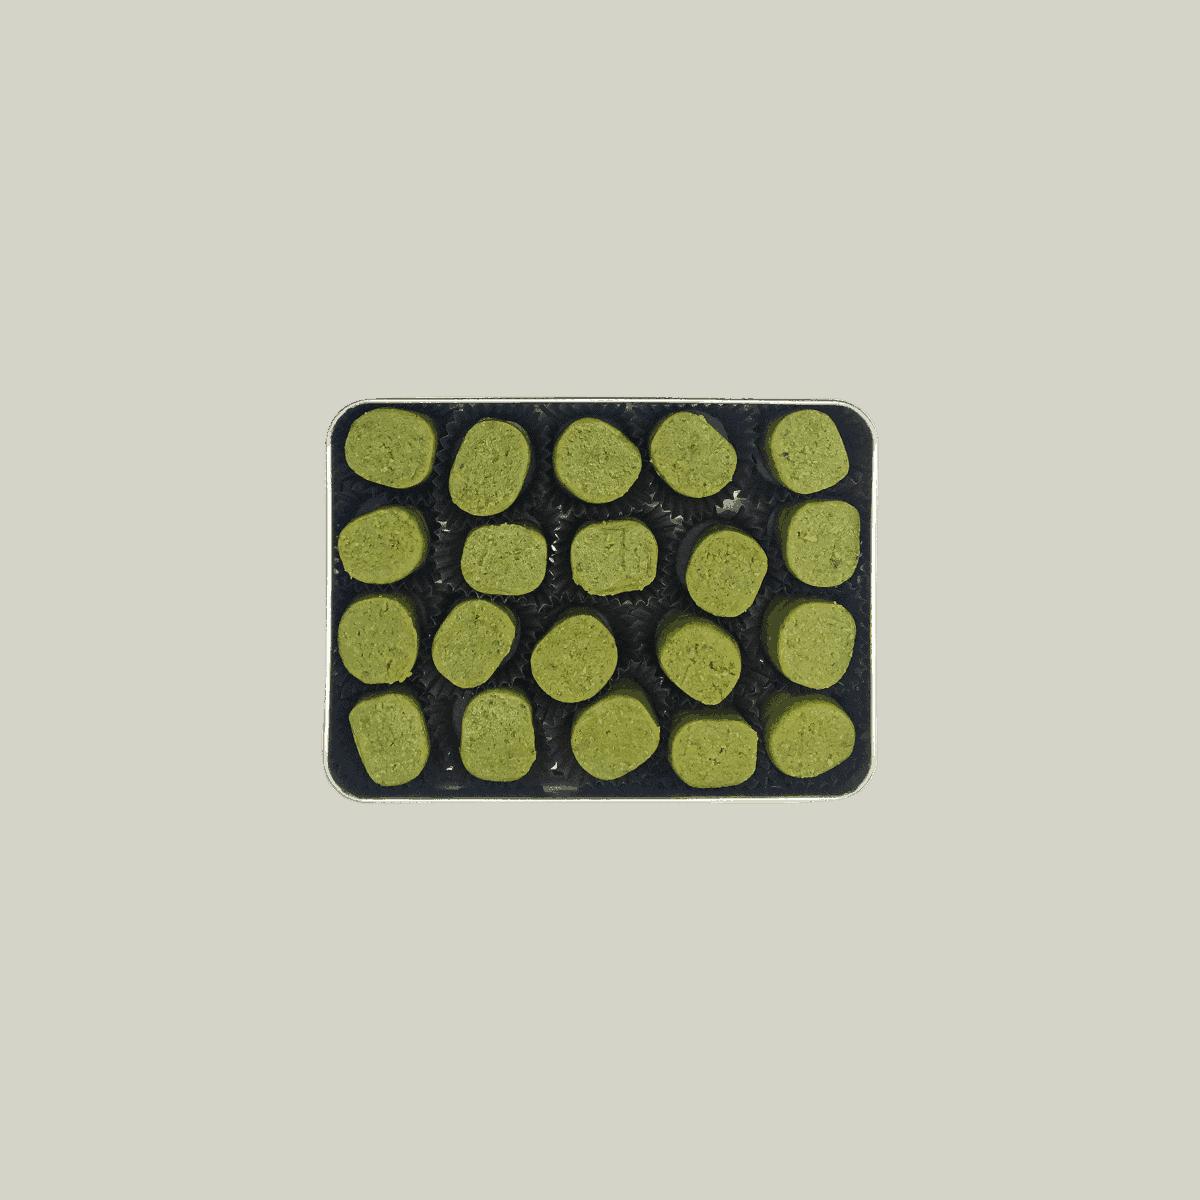 royalmond-pistachio-rolls-350g